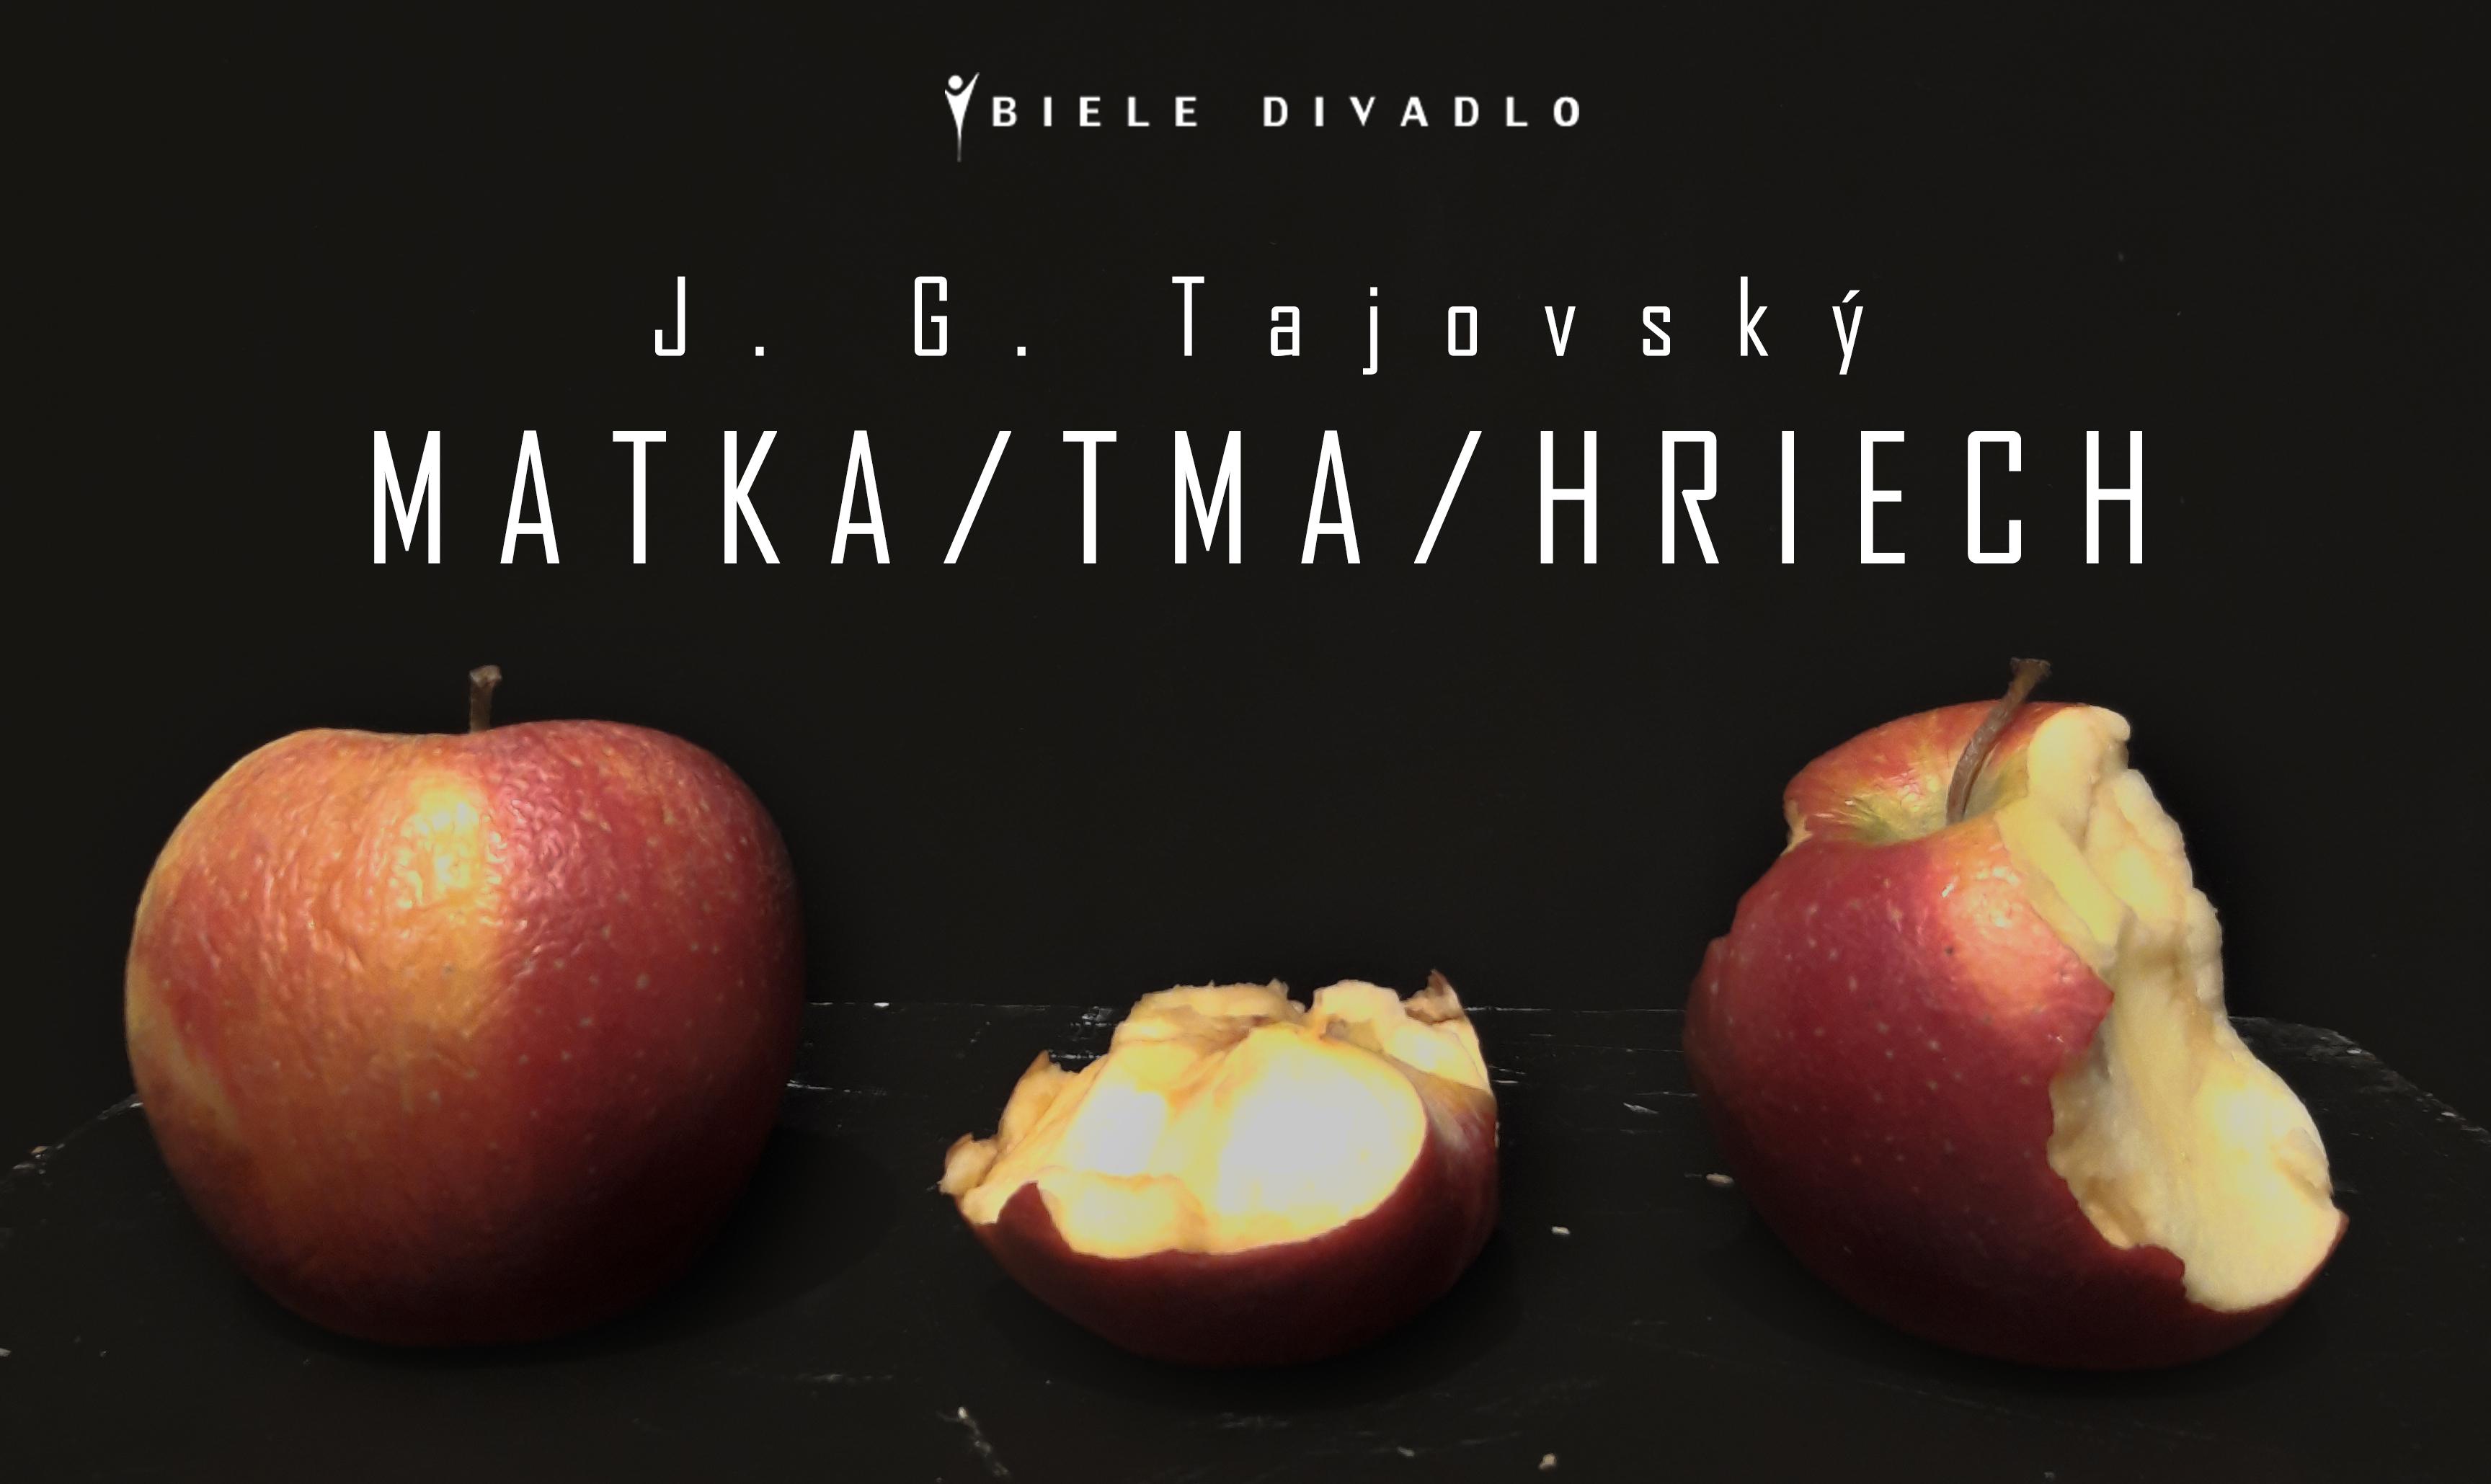 J G Tajovský – Matka/Tma/Hriech